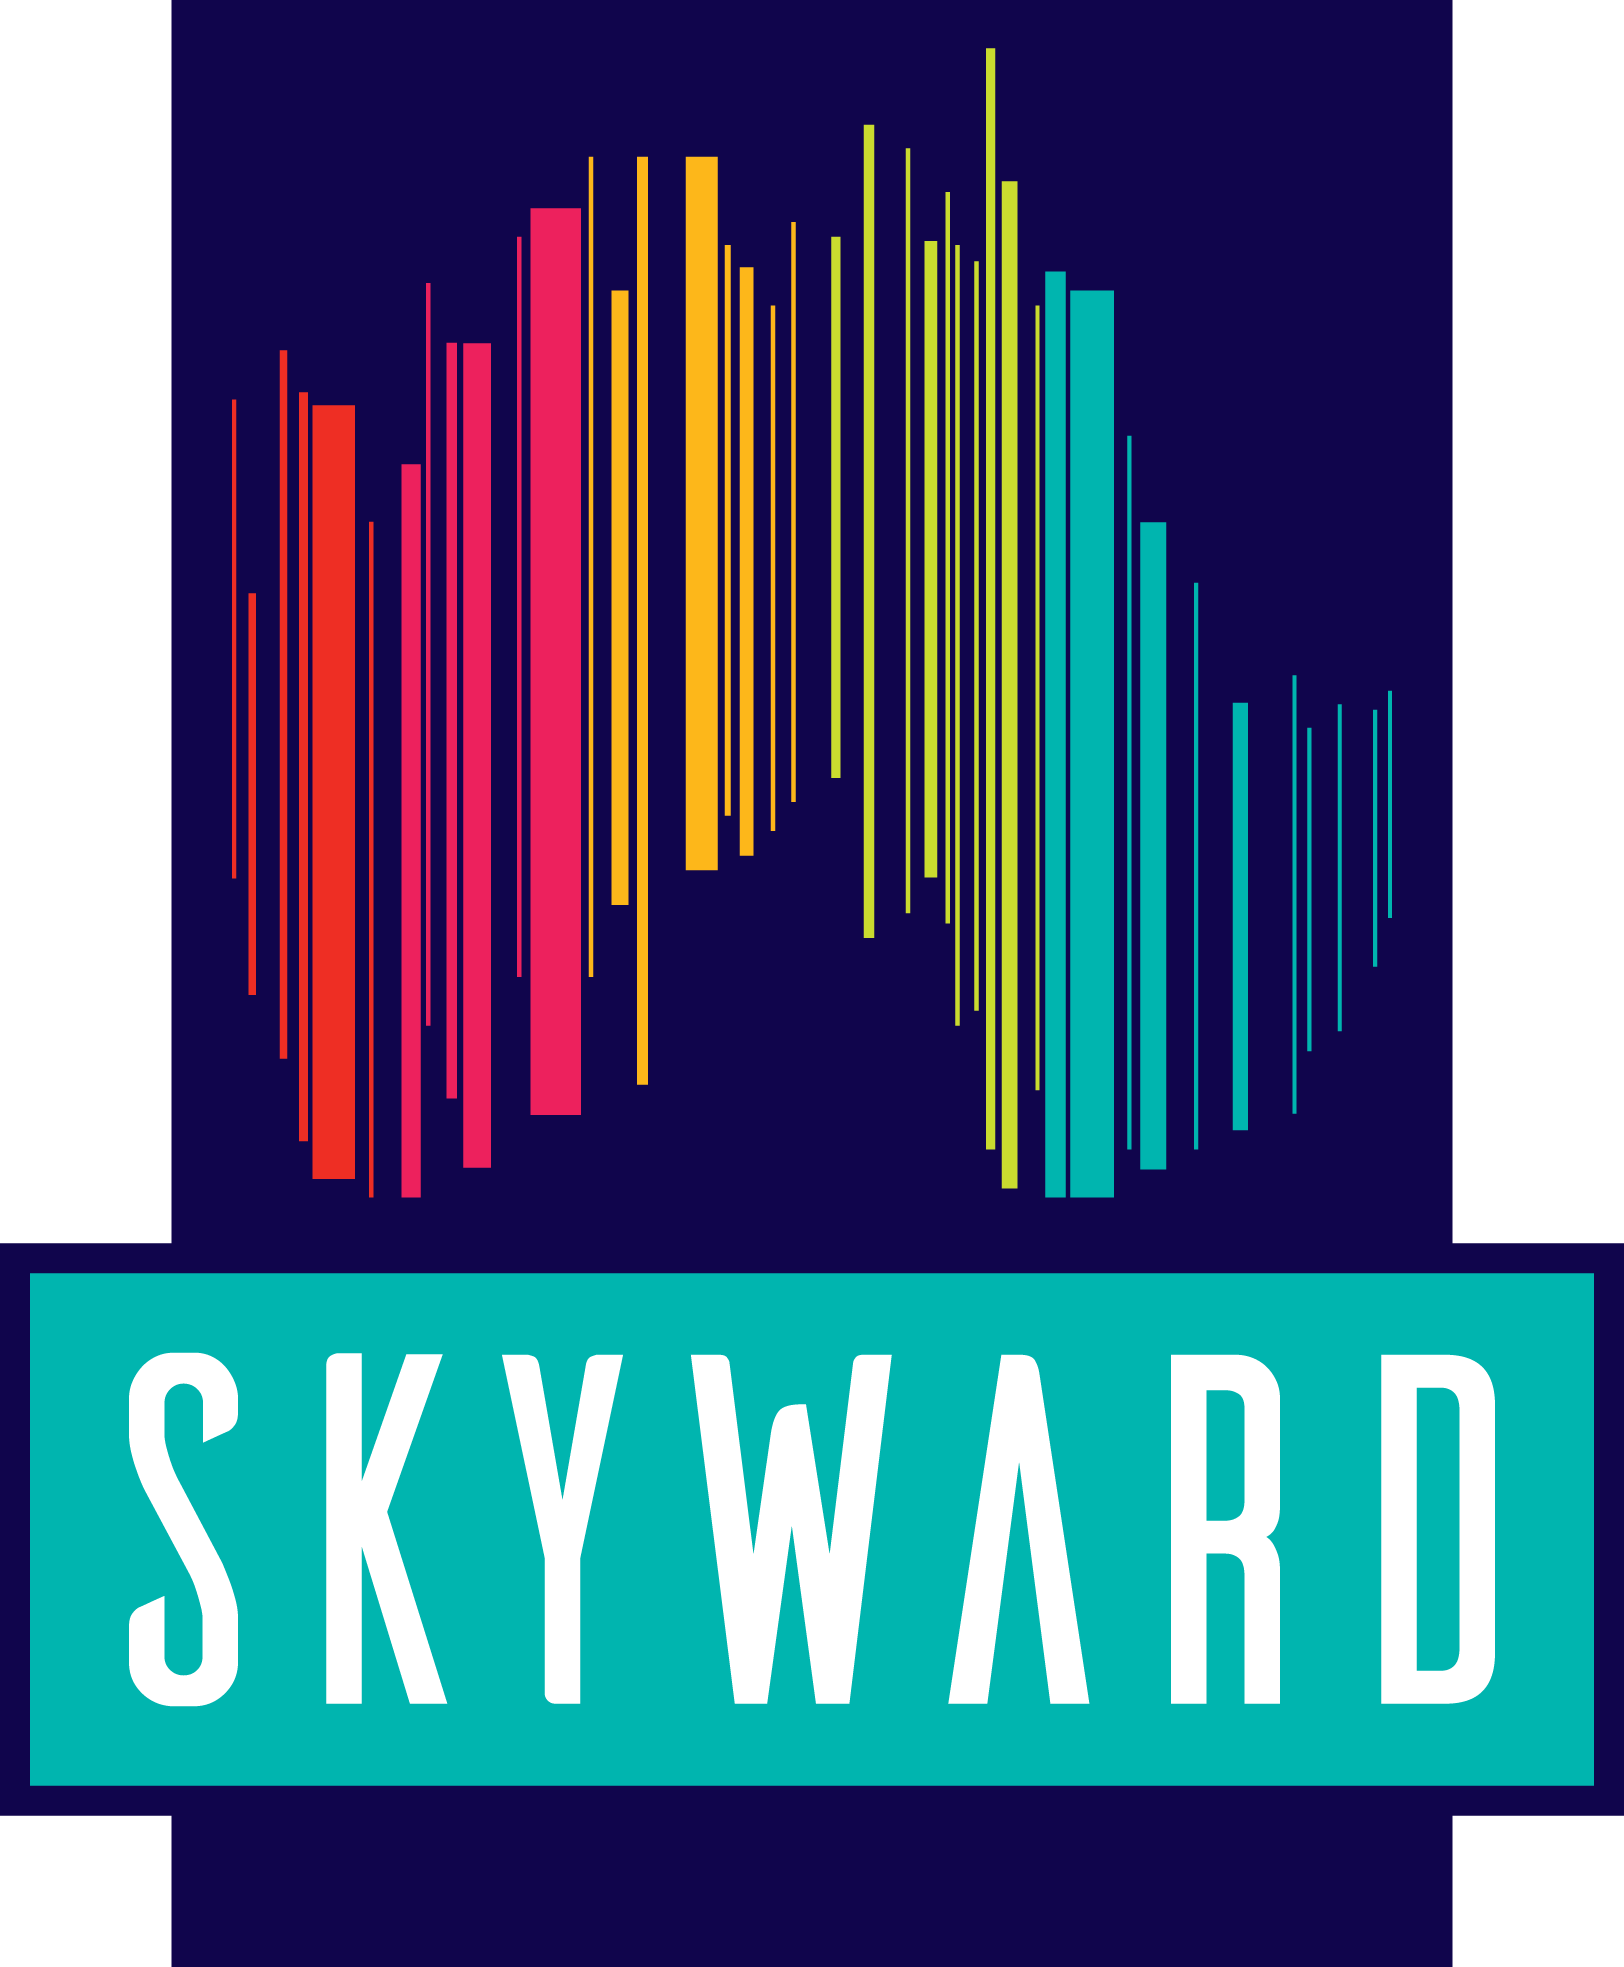 Skyward Living